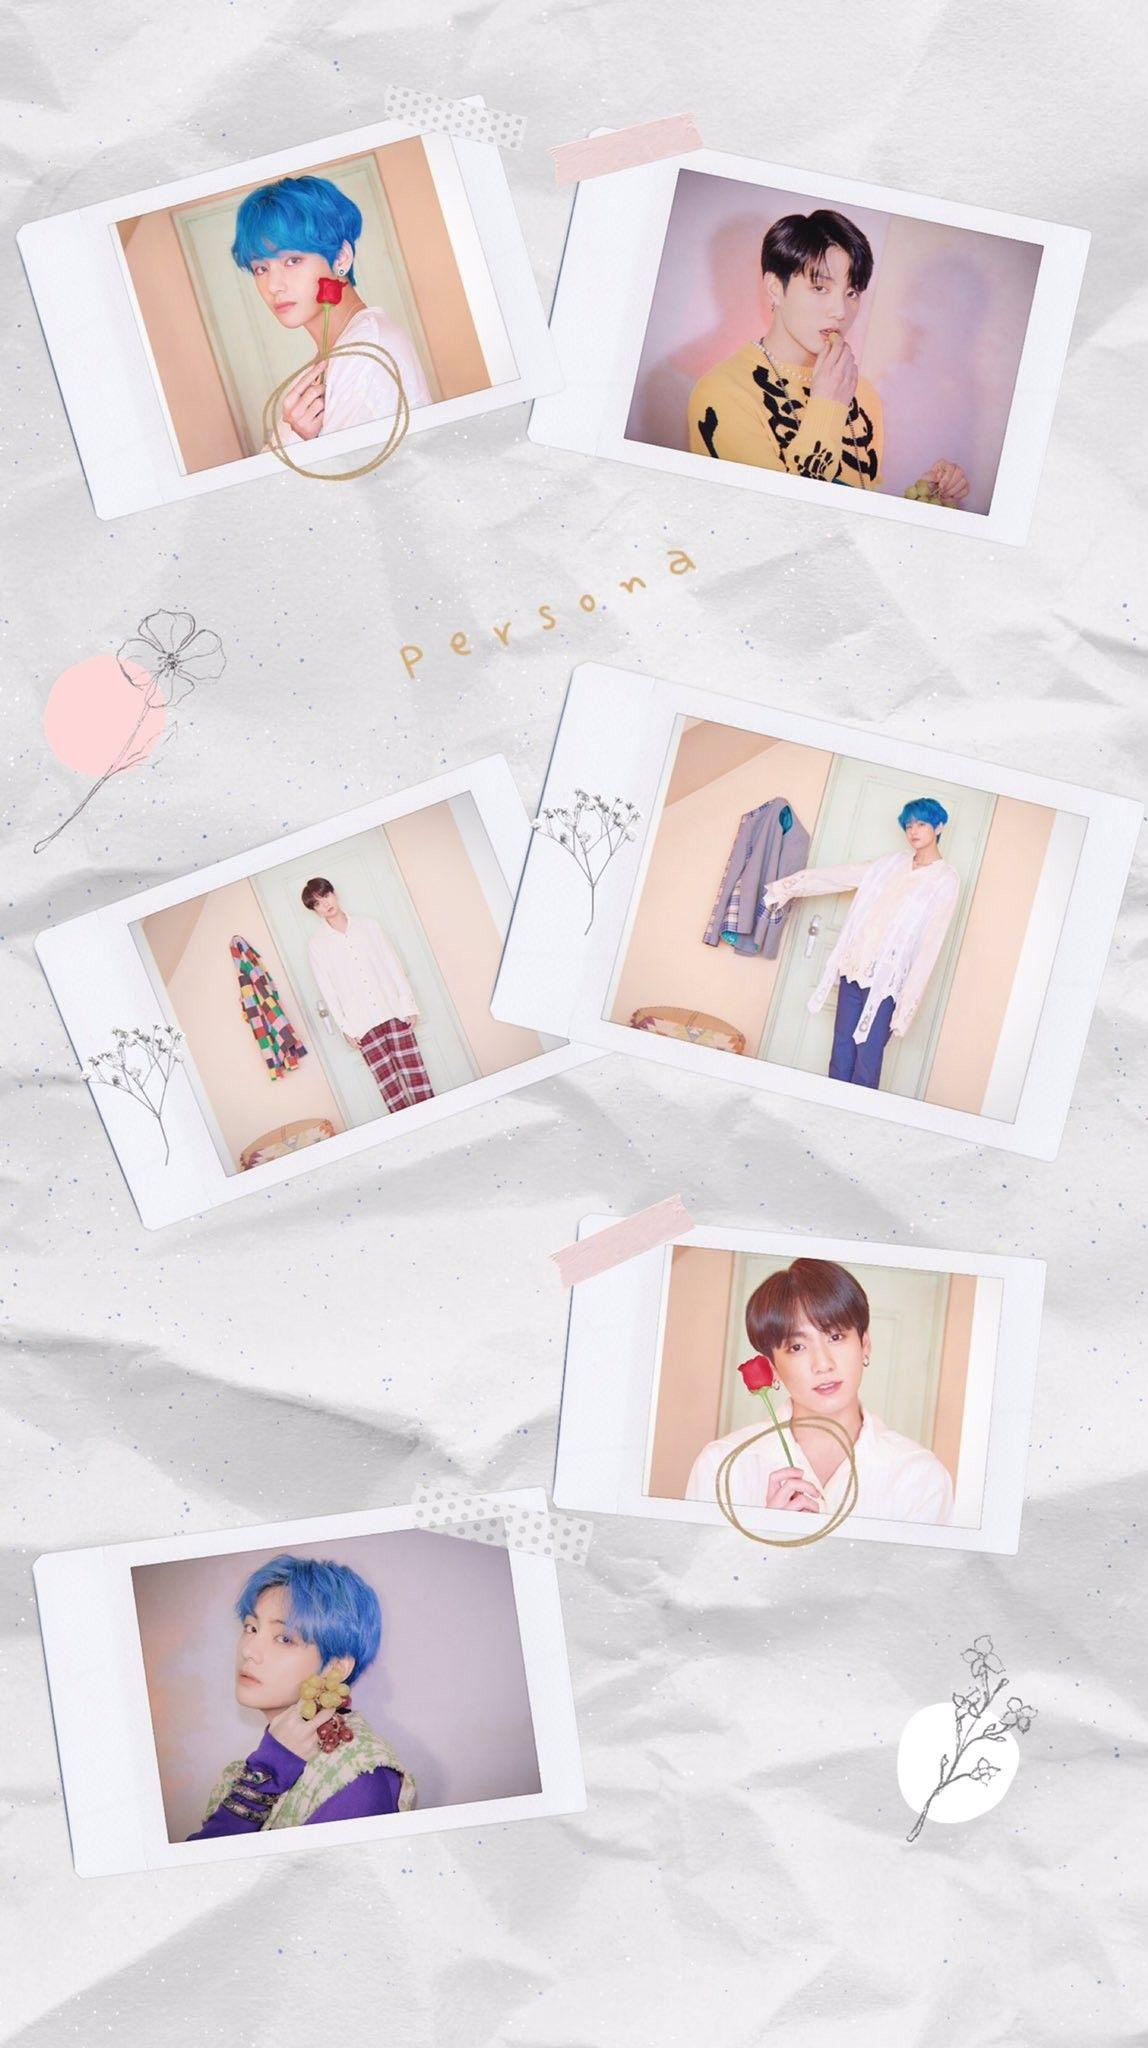 Persona Lockscreen Wallpaper Ot7 Gambar Bts Bts Gambar Gambar wallpaper wa bts